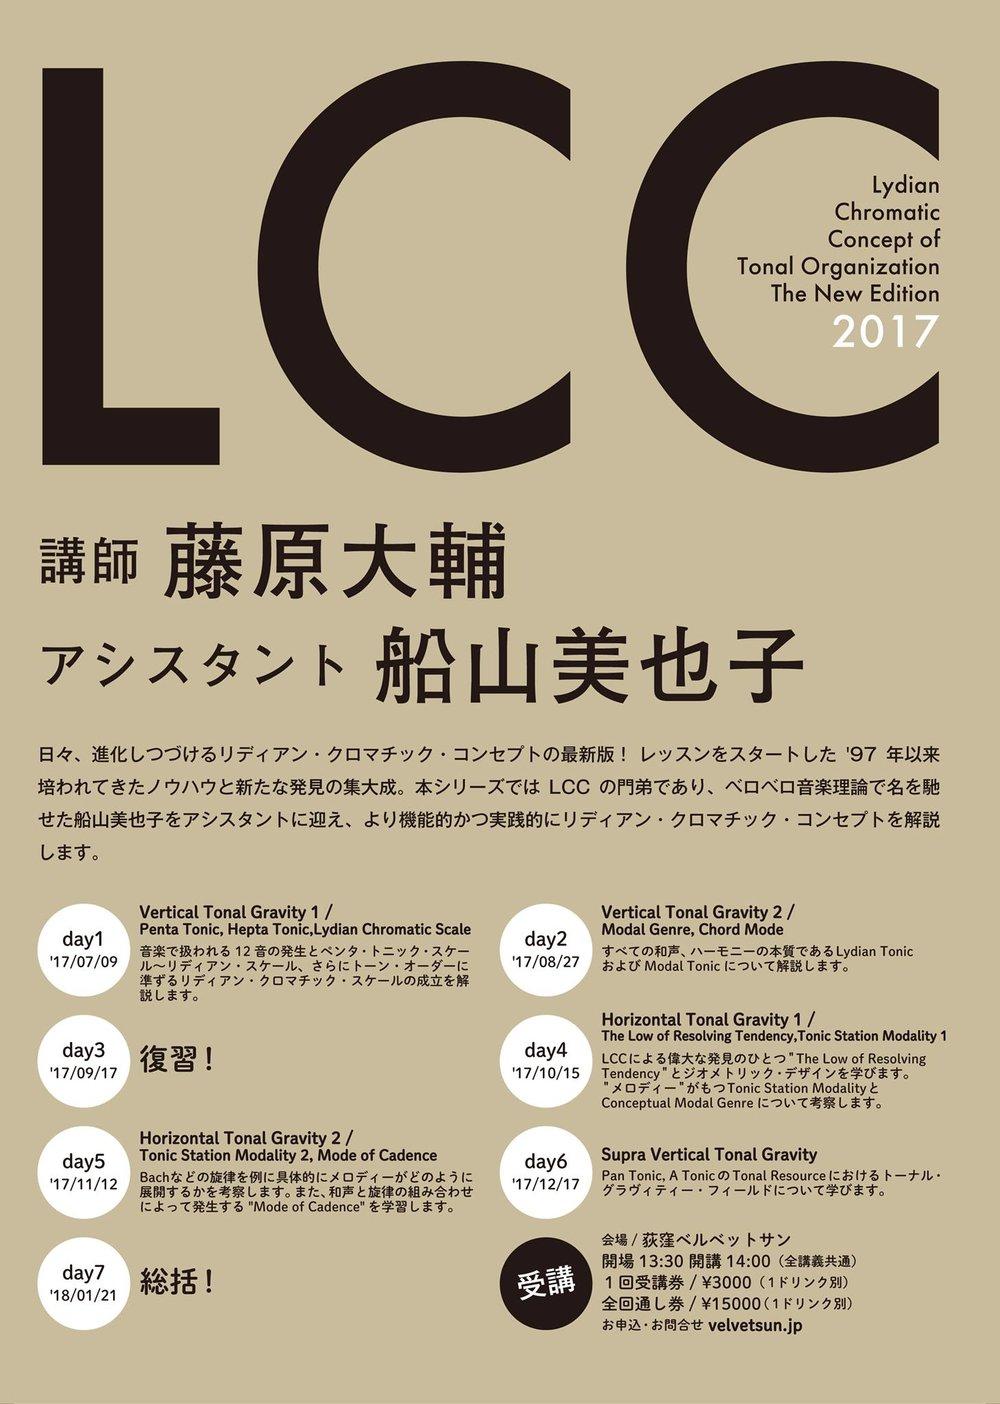 LCC.jpeg